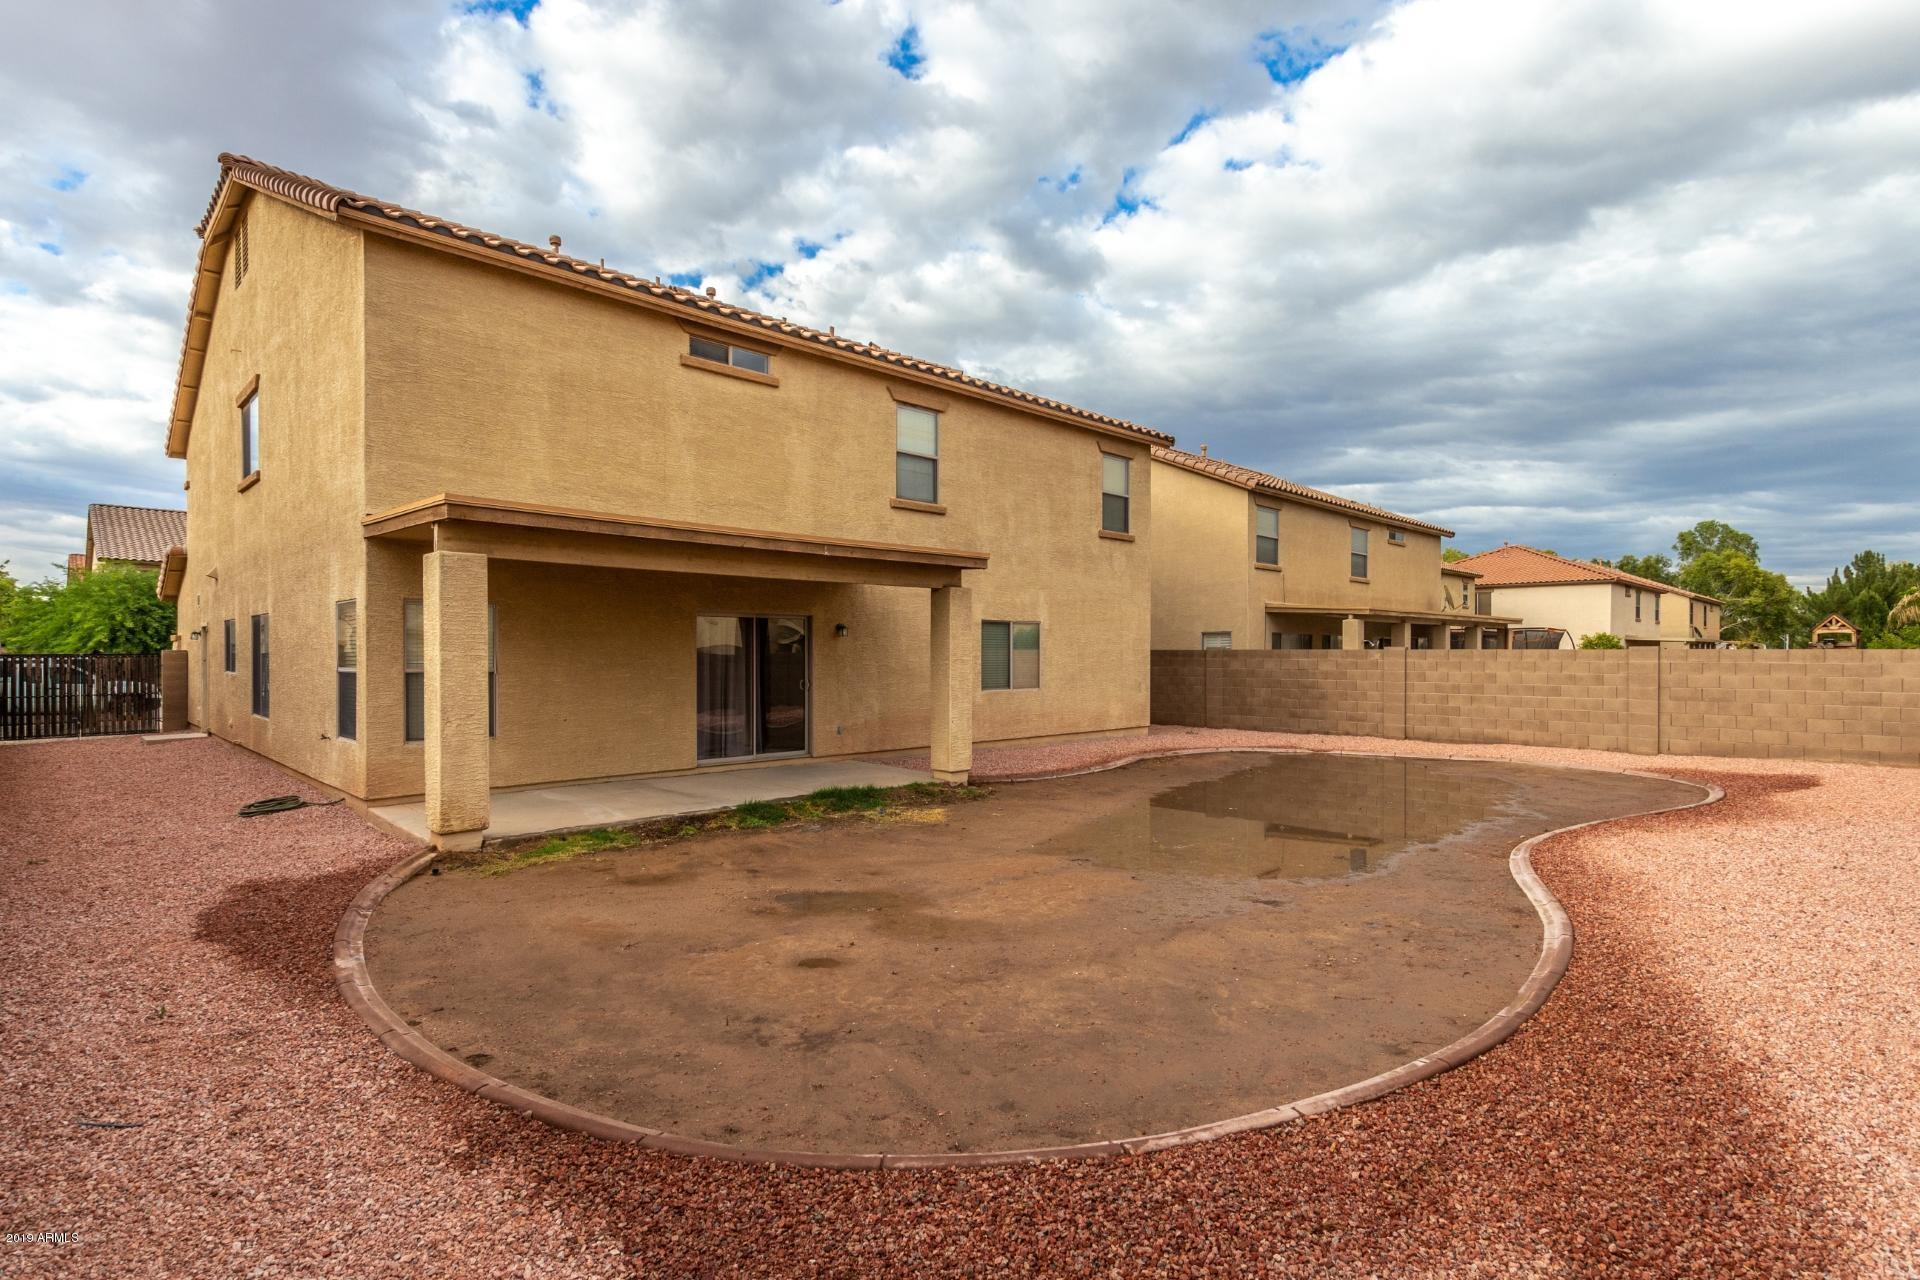 MLS 5930056 11867 W Tonto Street, Avondale, AZ 85323 Avondale AZ Glenhurst